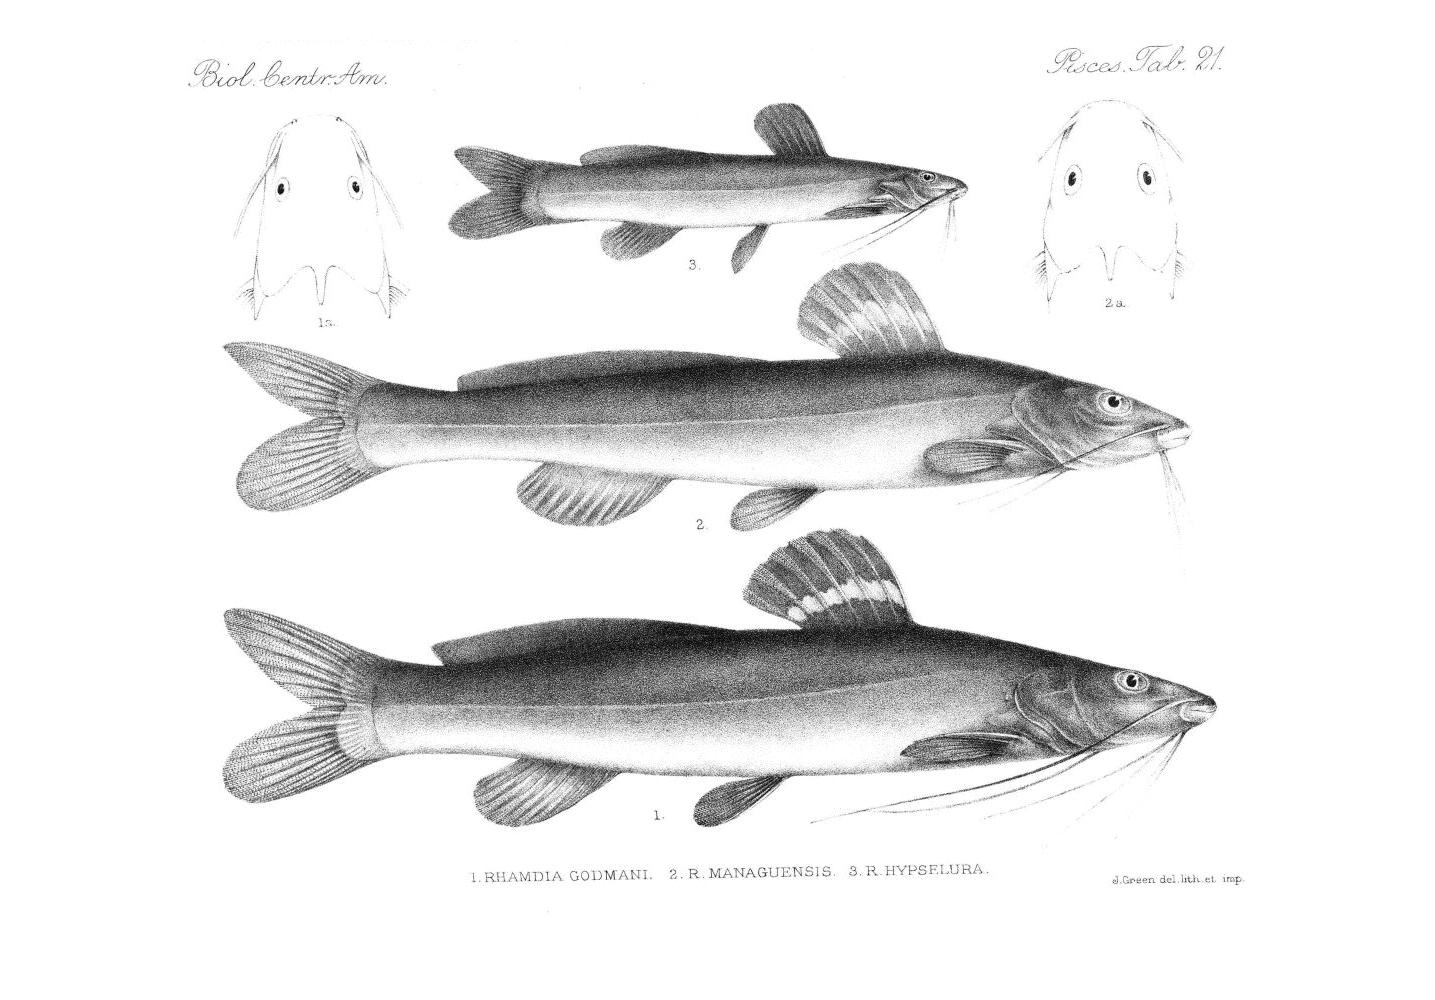 Fish,  Image number:bca_05_00_00_285